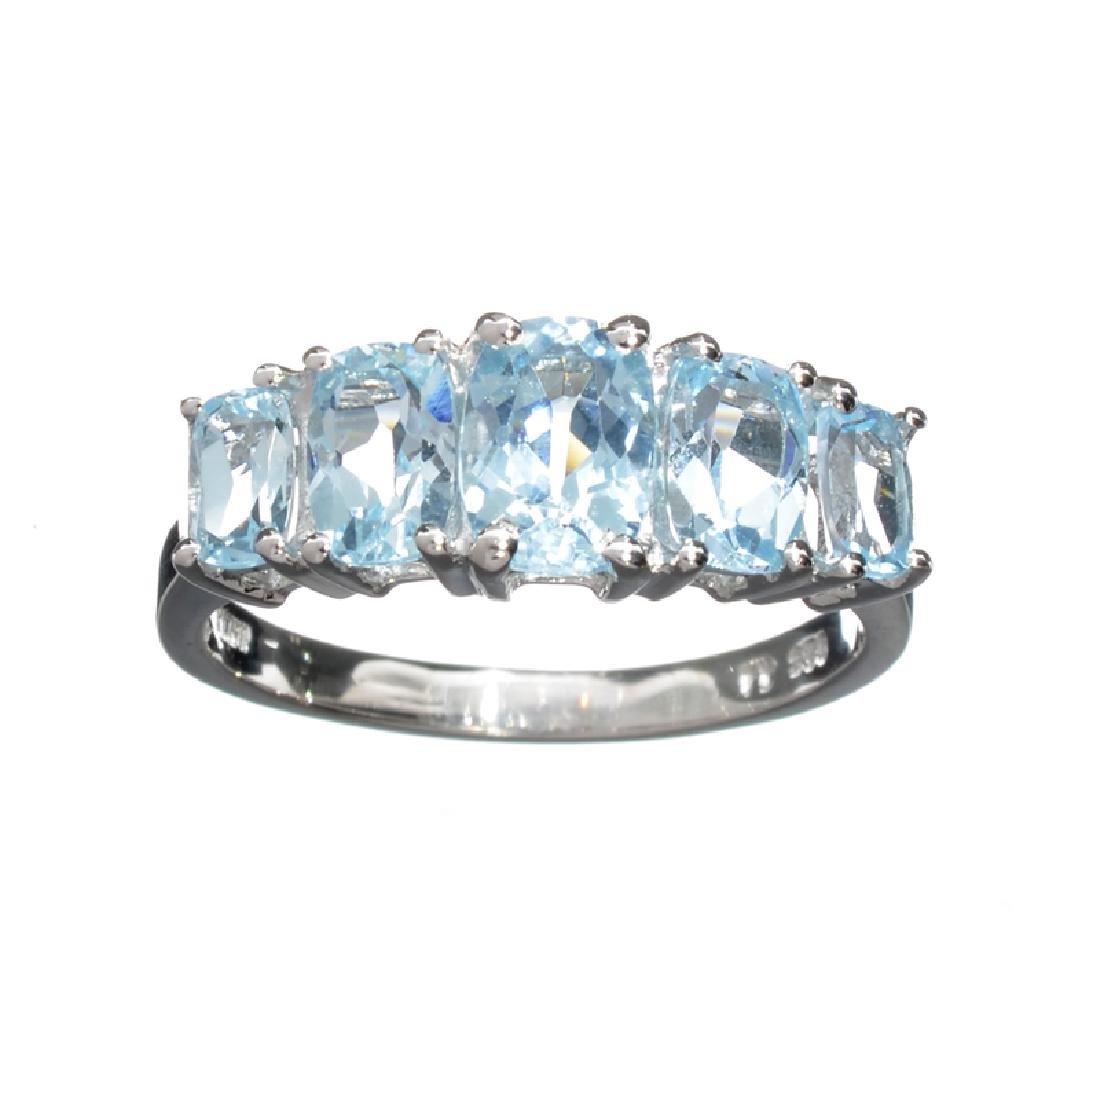 Fine Jewelry 2.00CT Oval Cut Light Blue Aquamarine